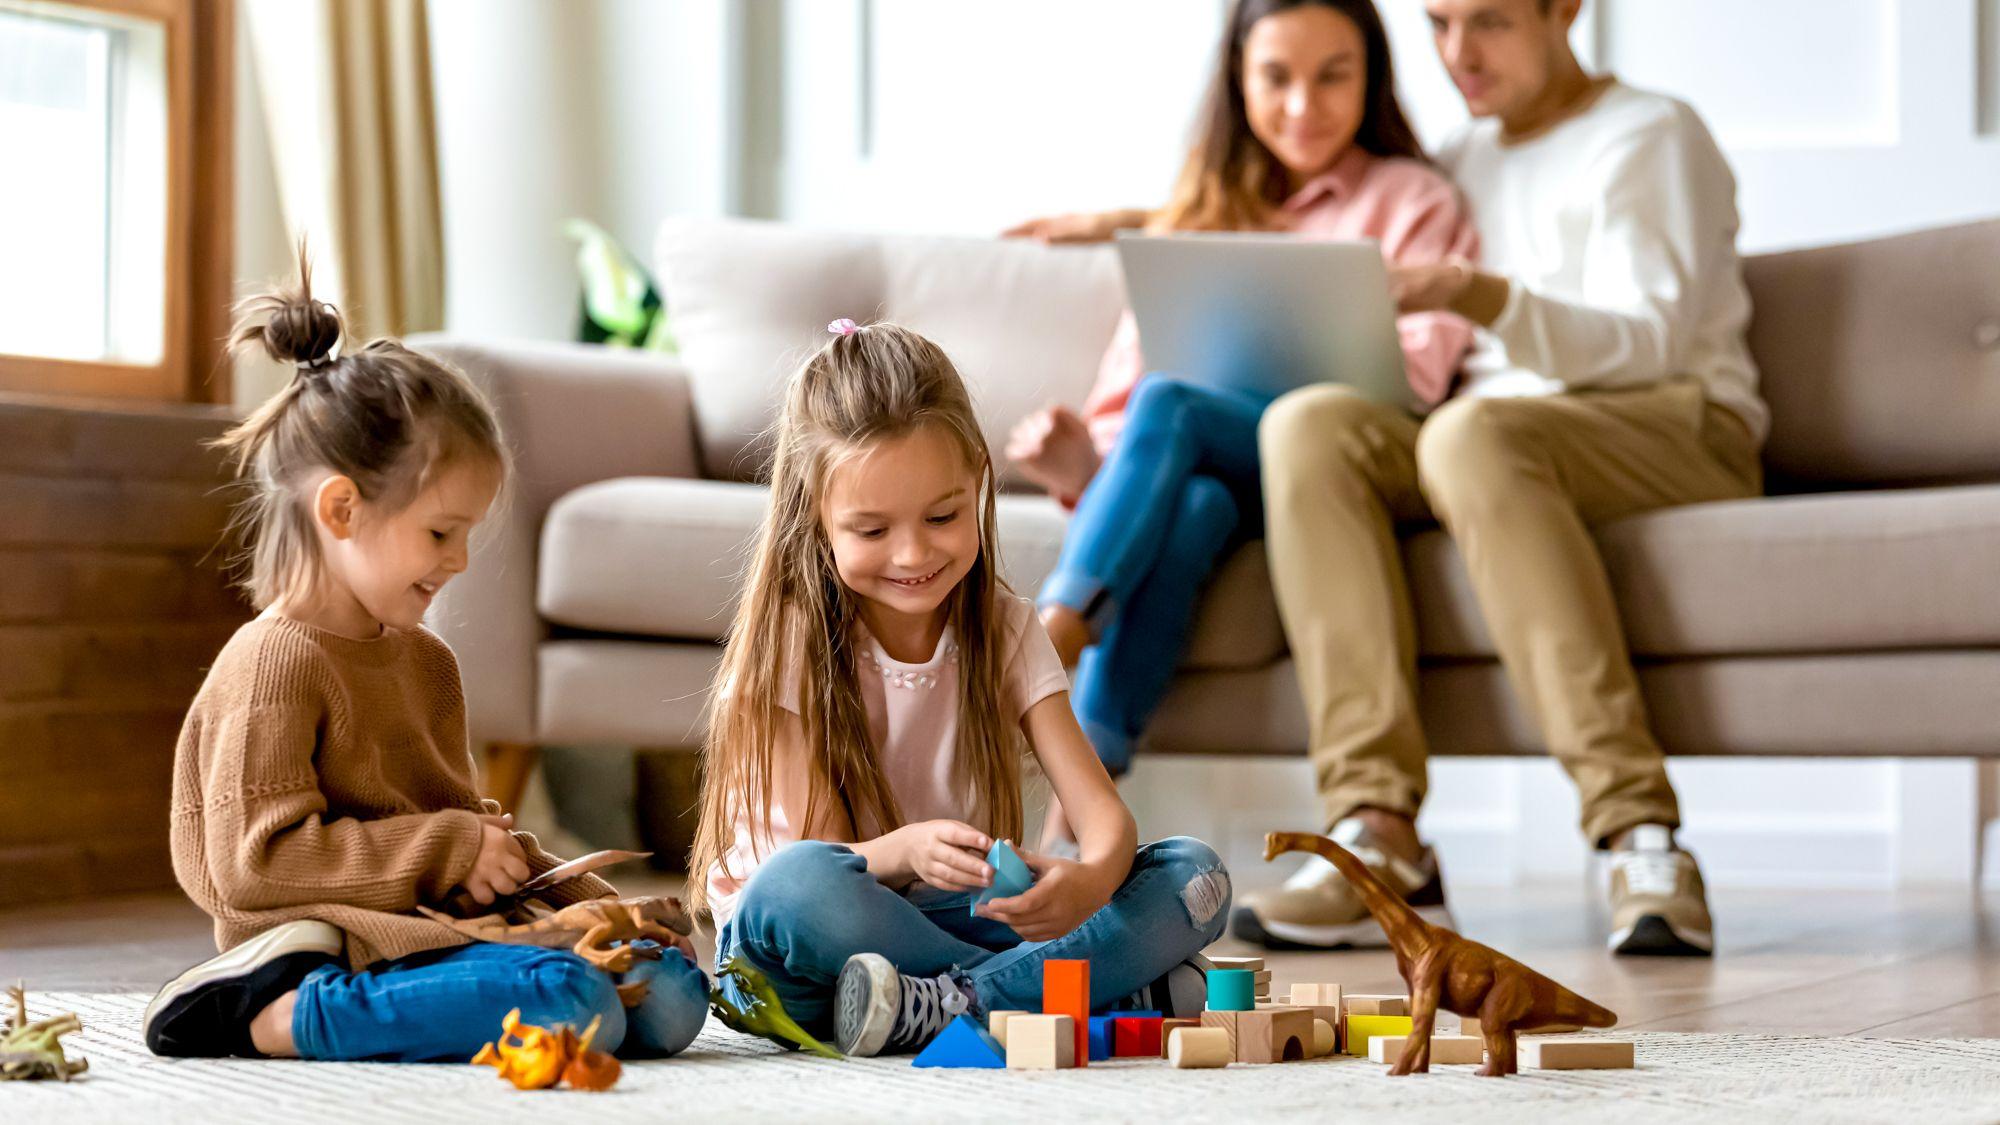 Children enjoying math over the summer vacations